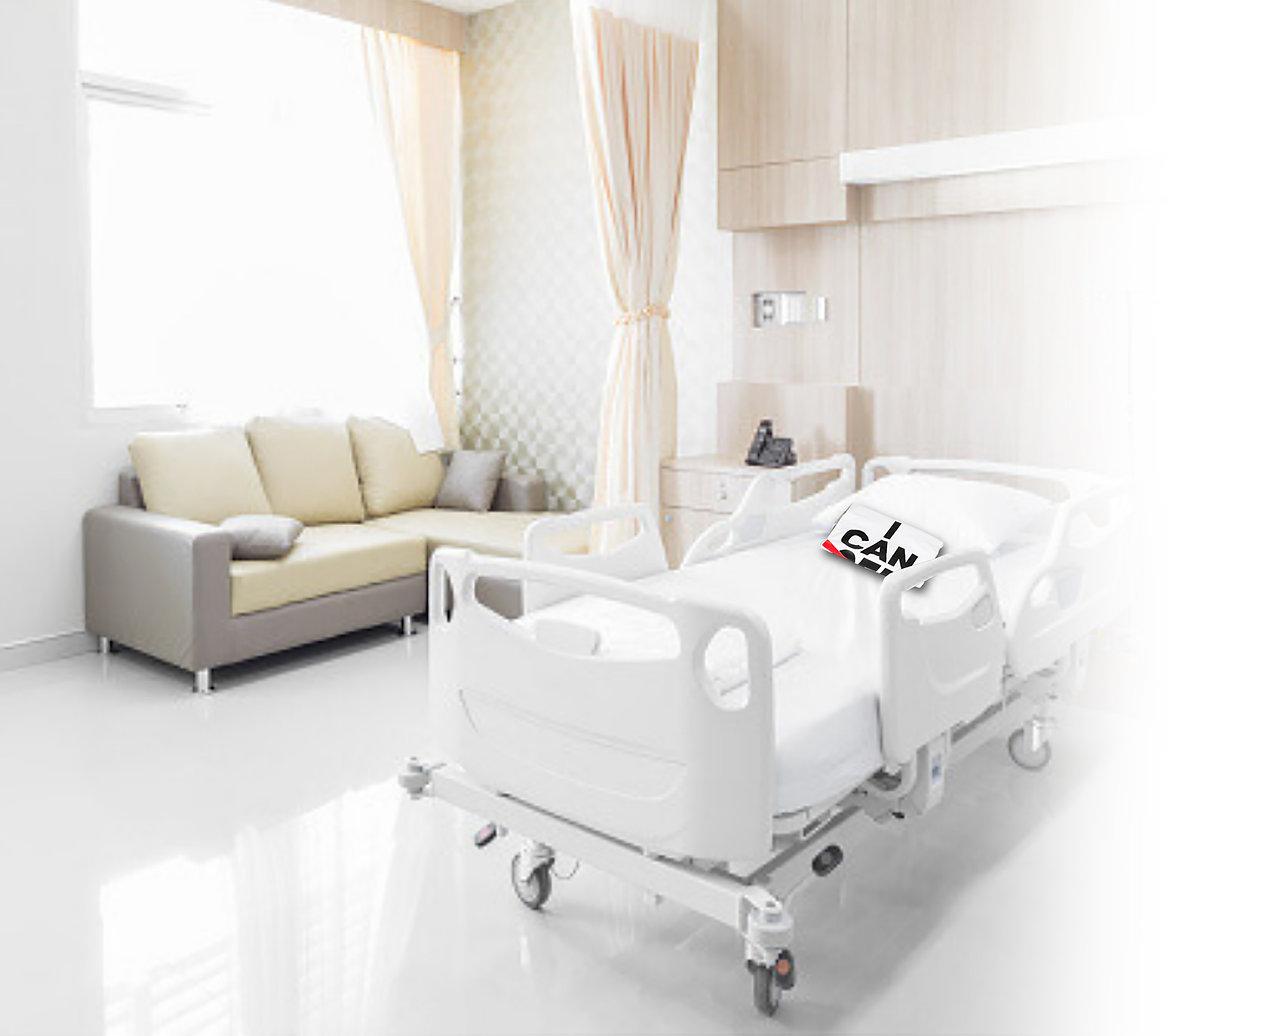 Hospital Bed White Shade.jpg